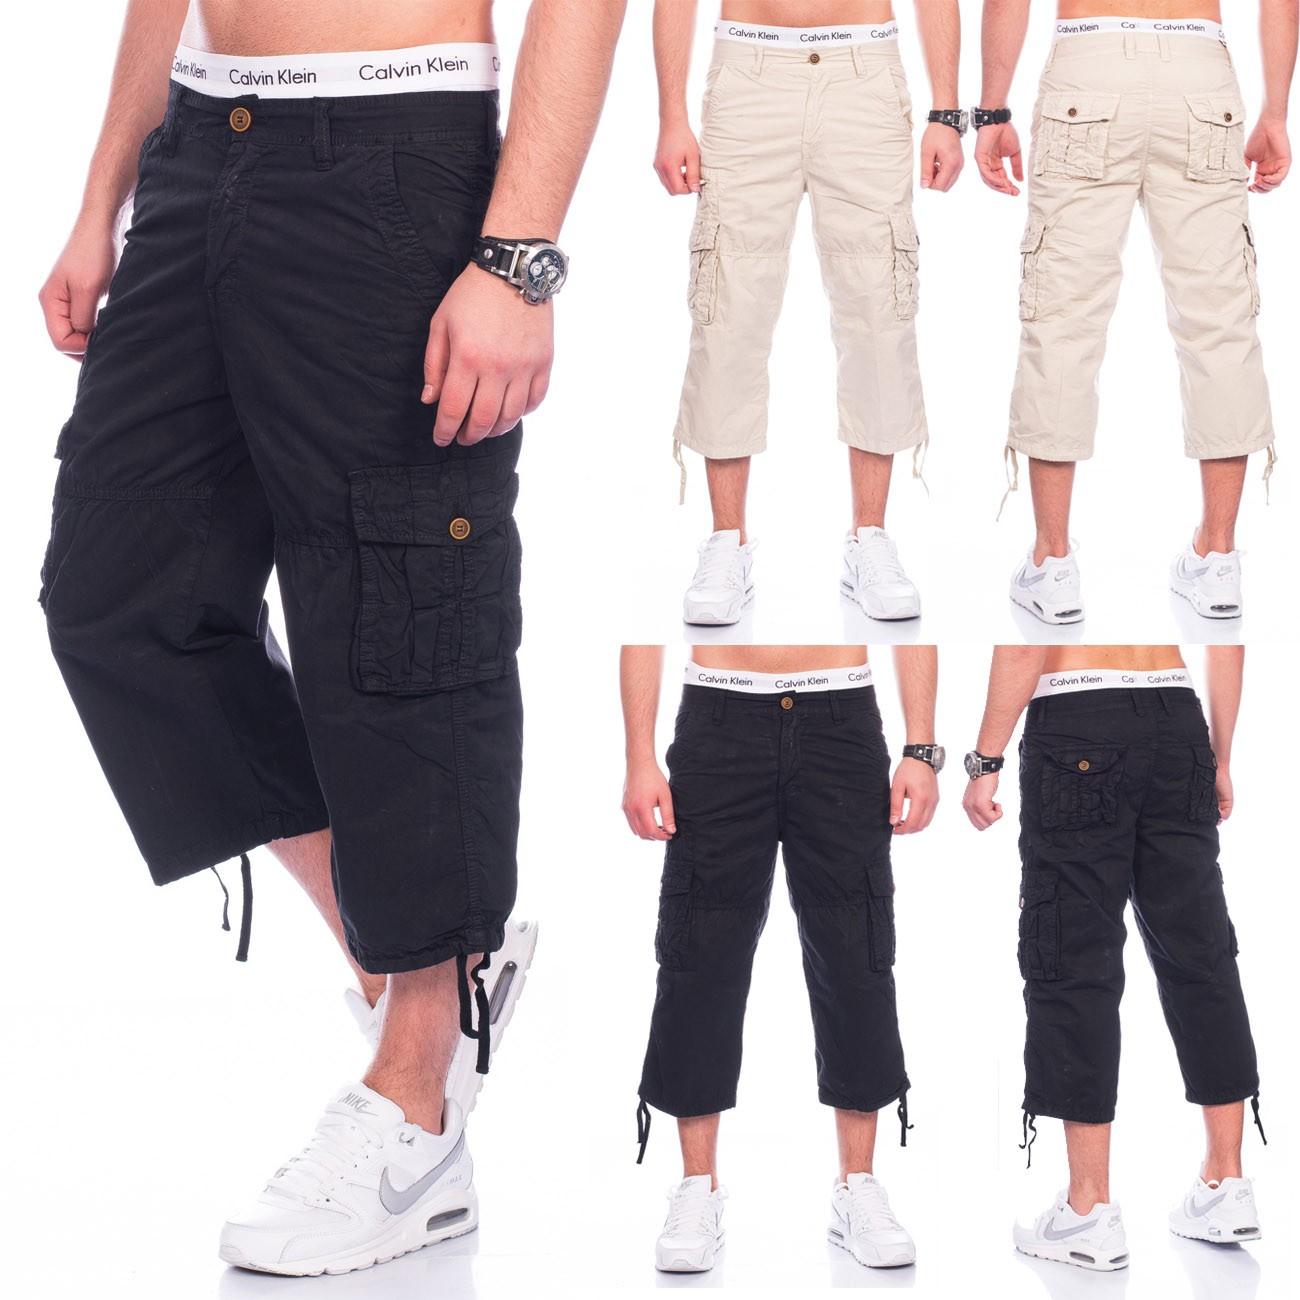 Herren Bermudas Cargo Shorts kurze Hose 100% Baumwolle Sommer Jeans  Caprihose - Nr 1459 62030f697e